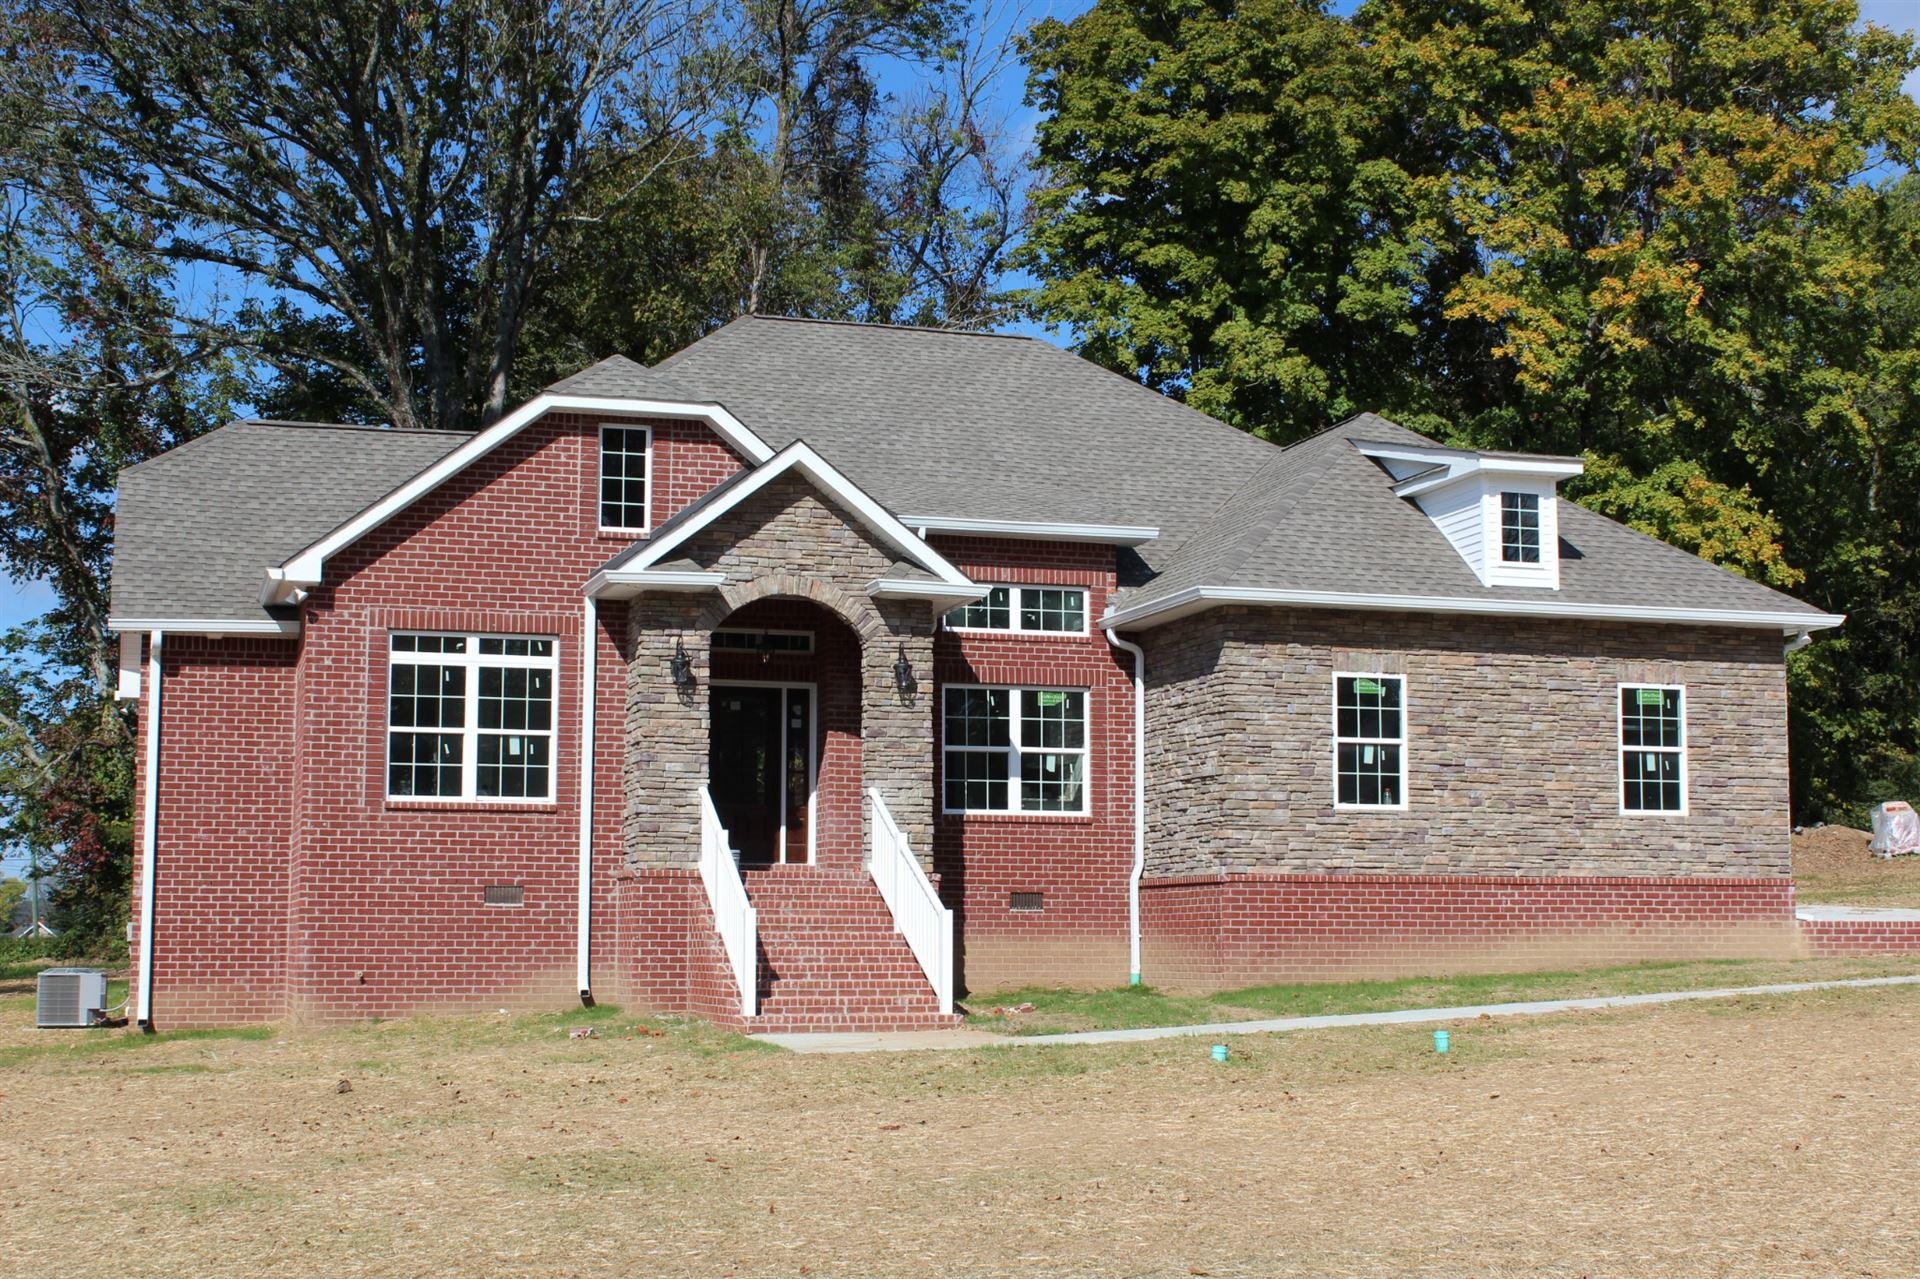 55 Mockingbird Ln, Hartsville, TN 37074 - MLS#: 2196274